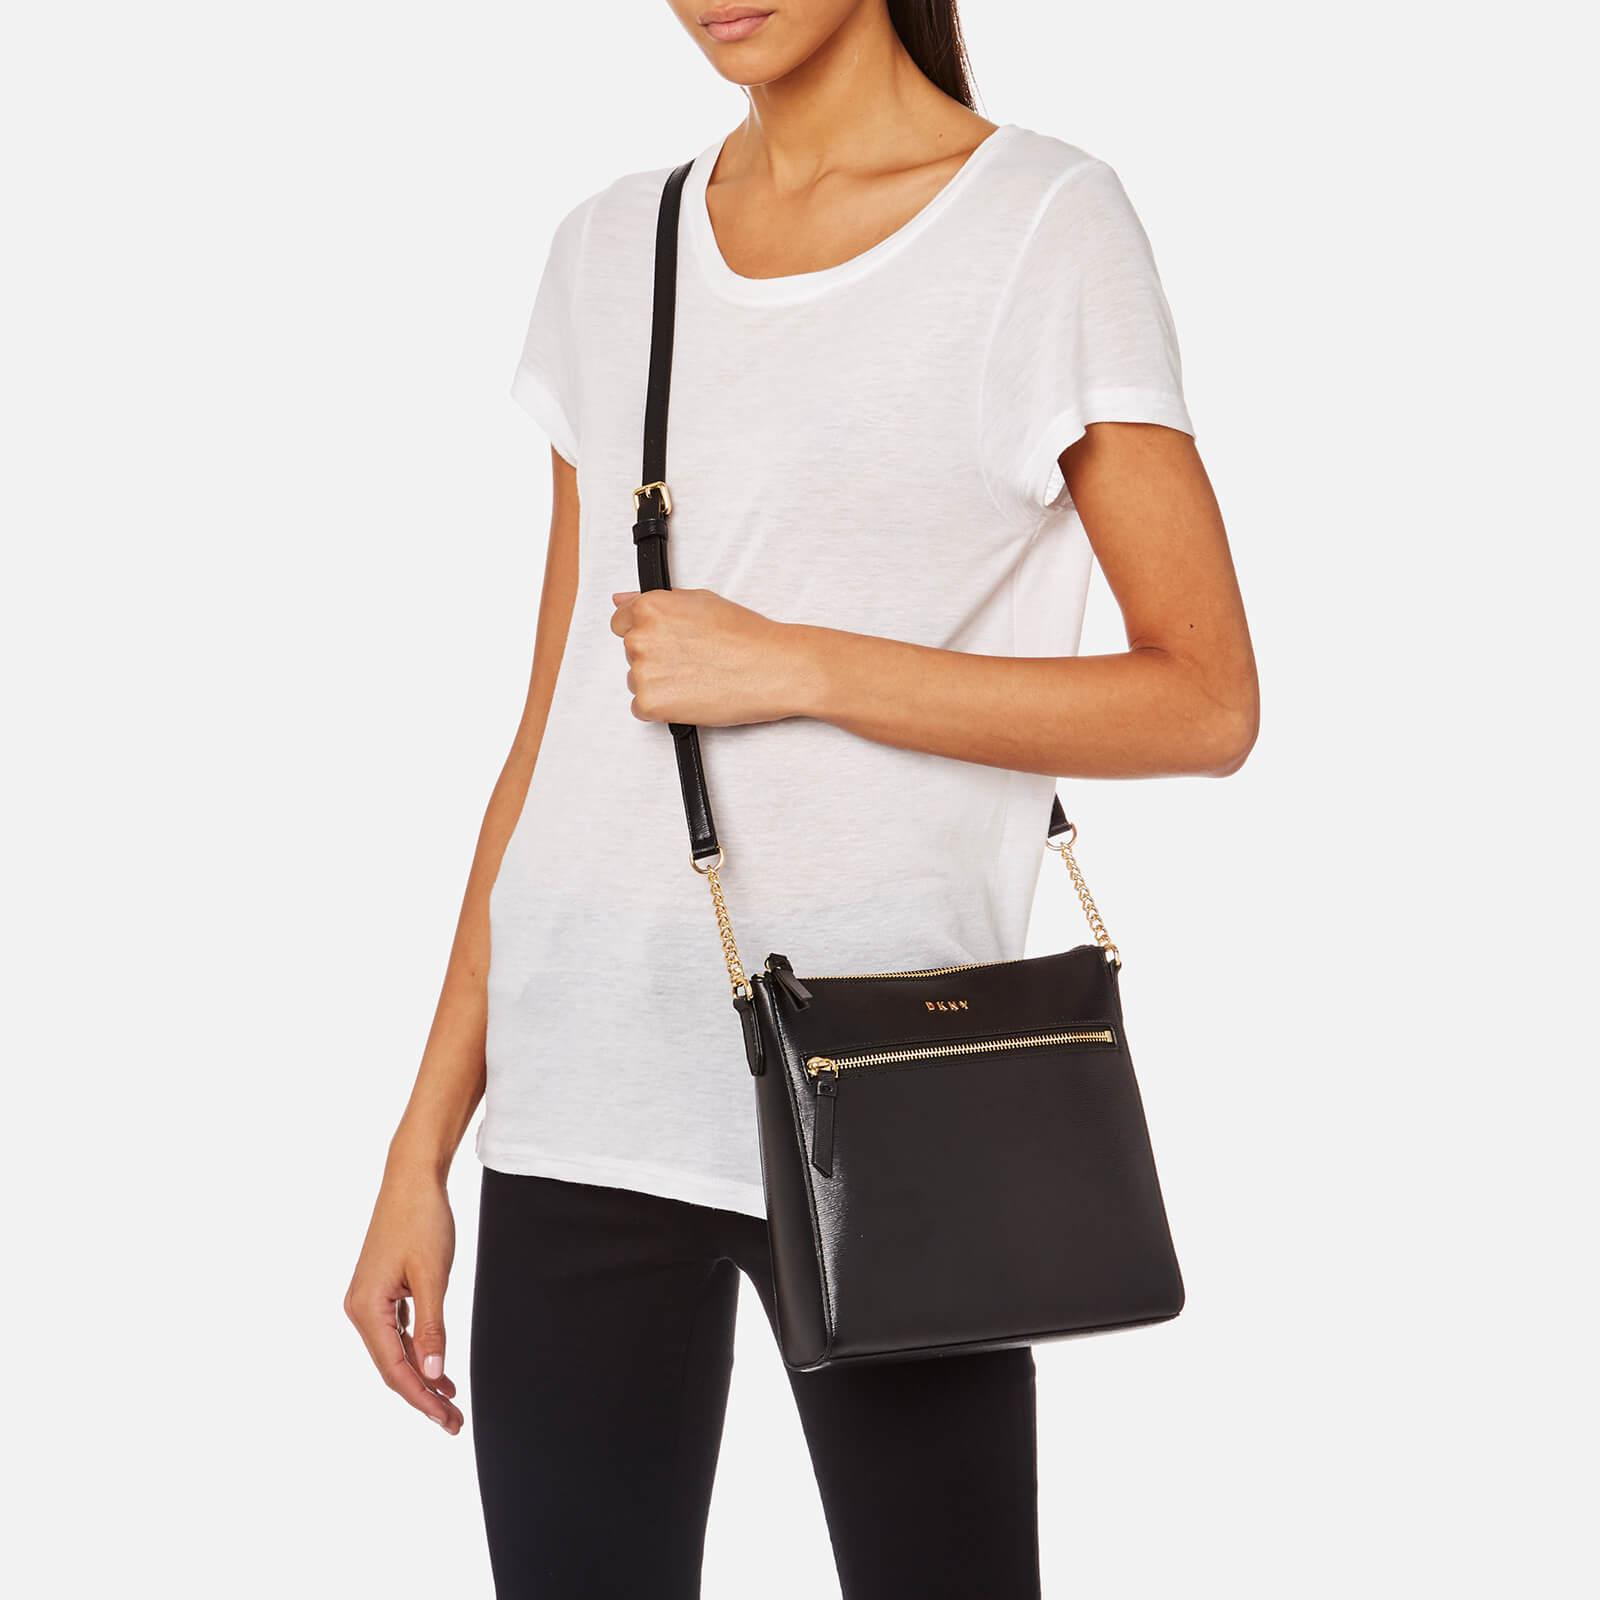 a06864825c6 DKNY Women s Bryant Top Zip Cross Body Bag in Black - Lyst